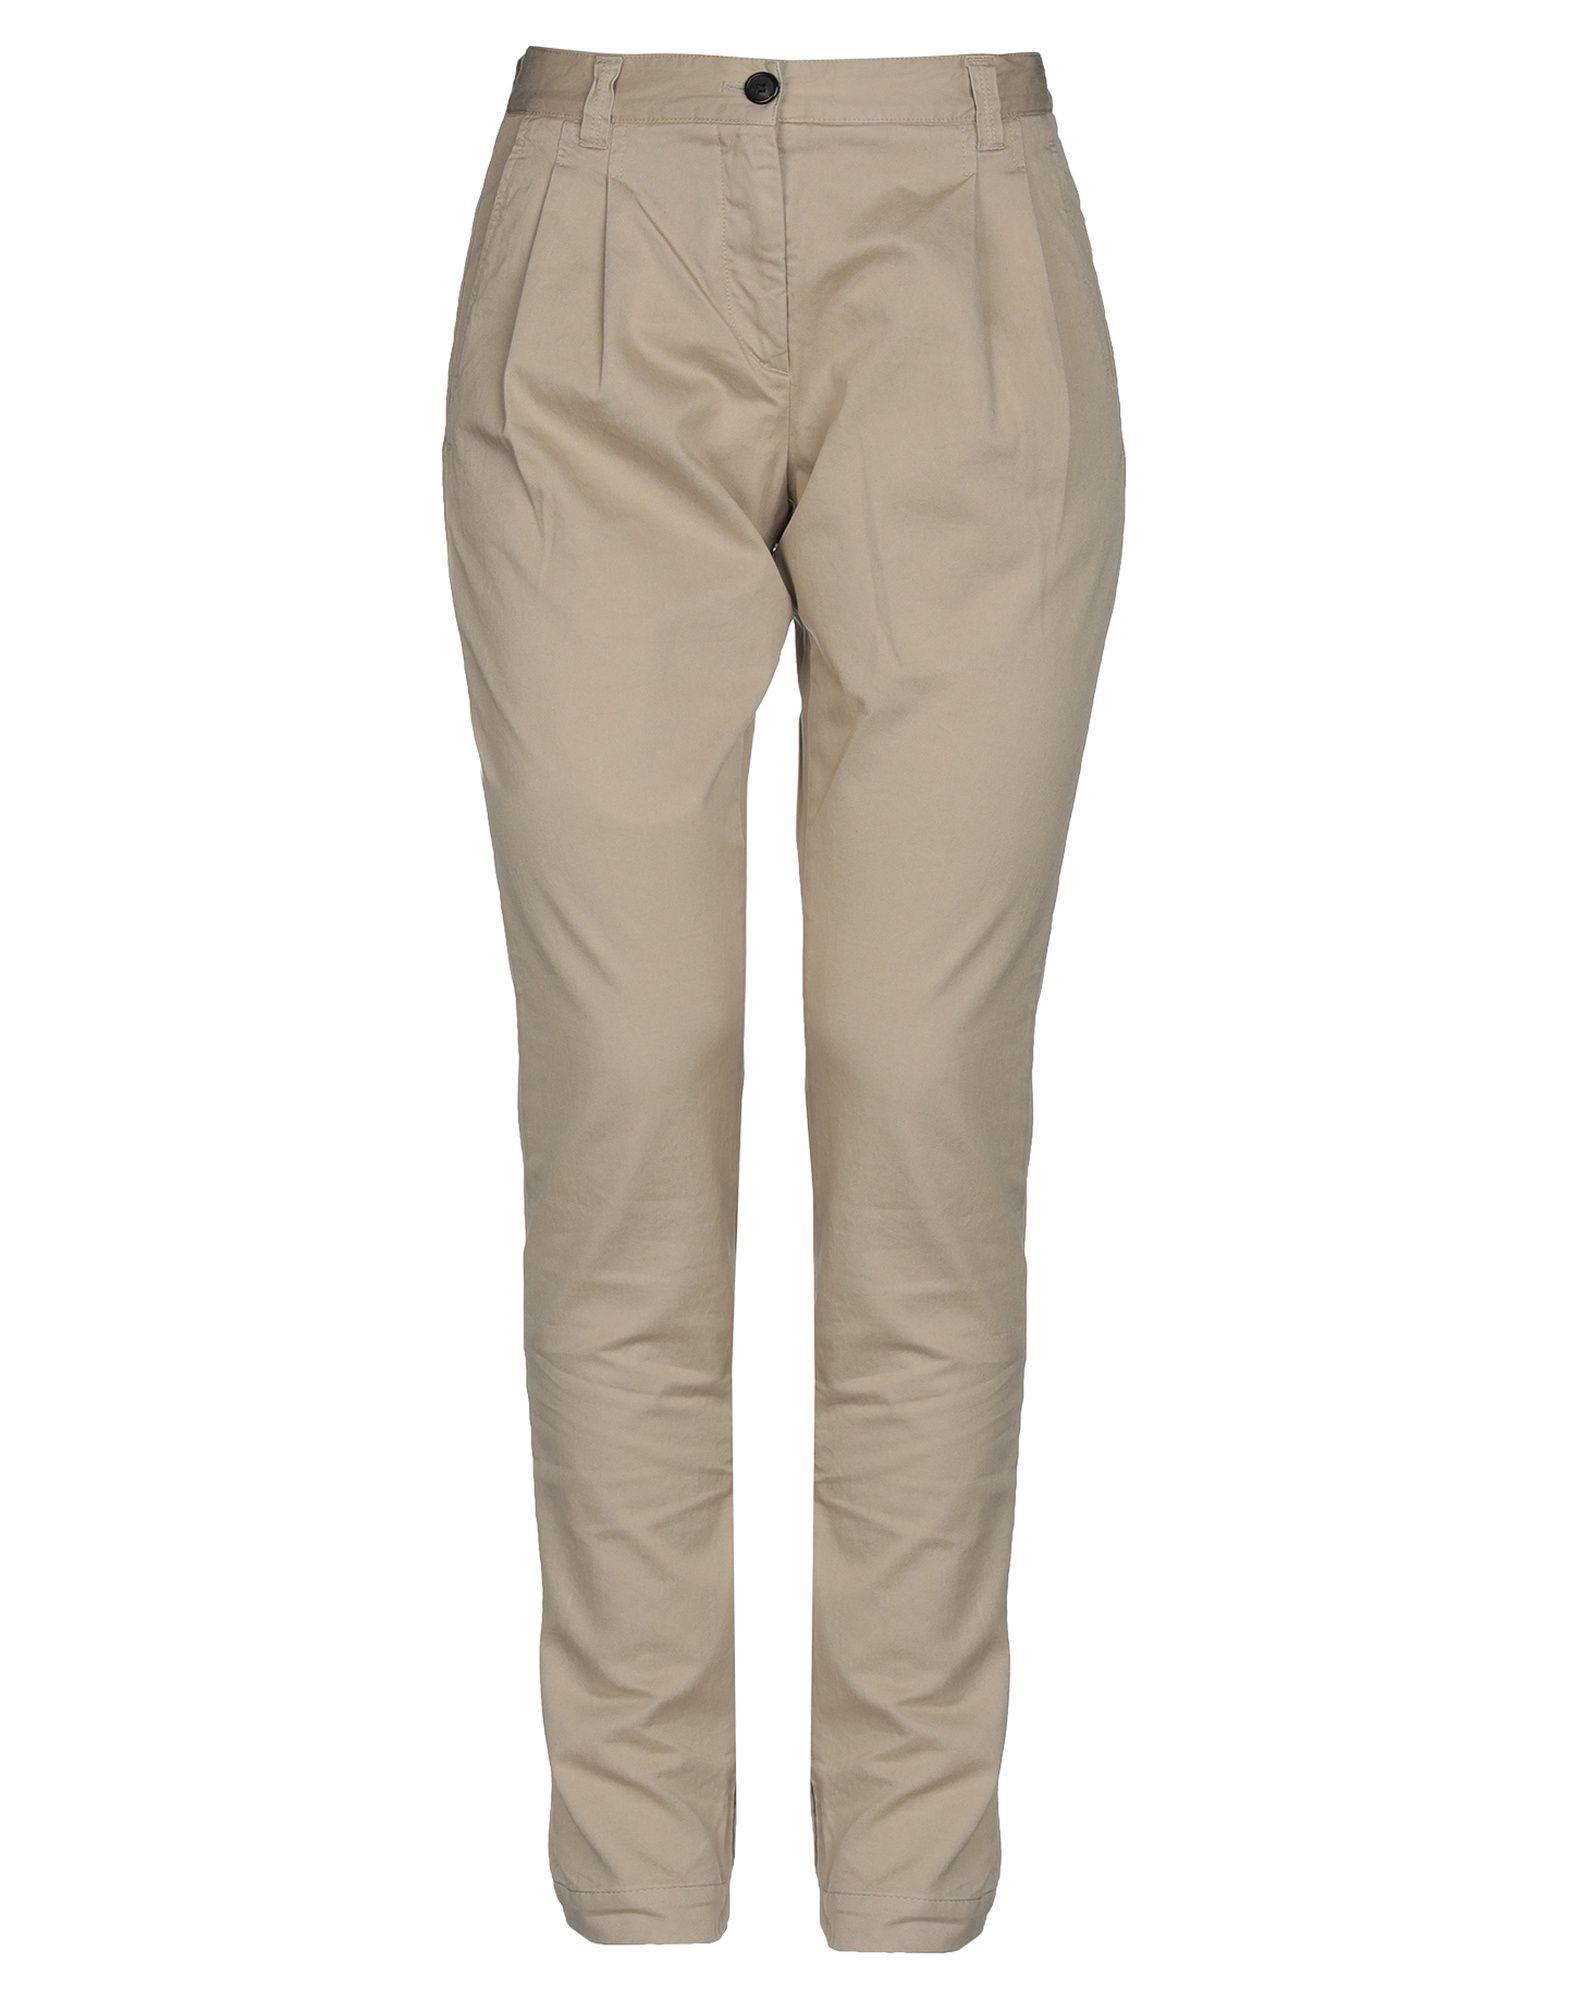 Pantalone Mauro Grifoni damen - 13297452LF